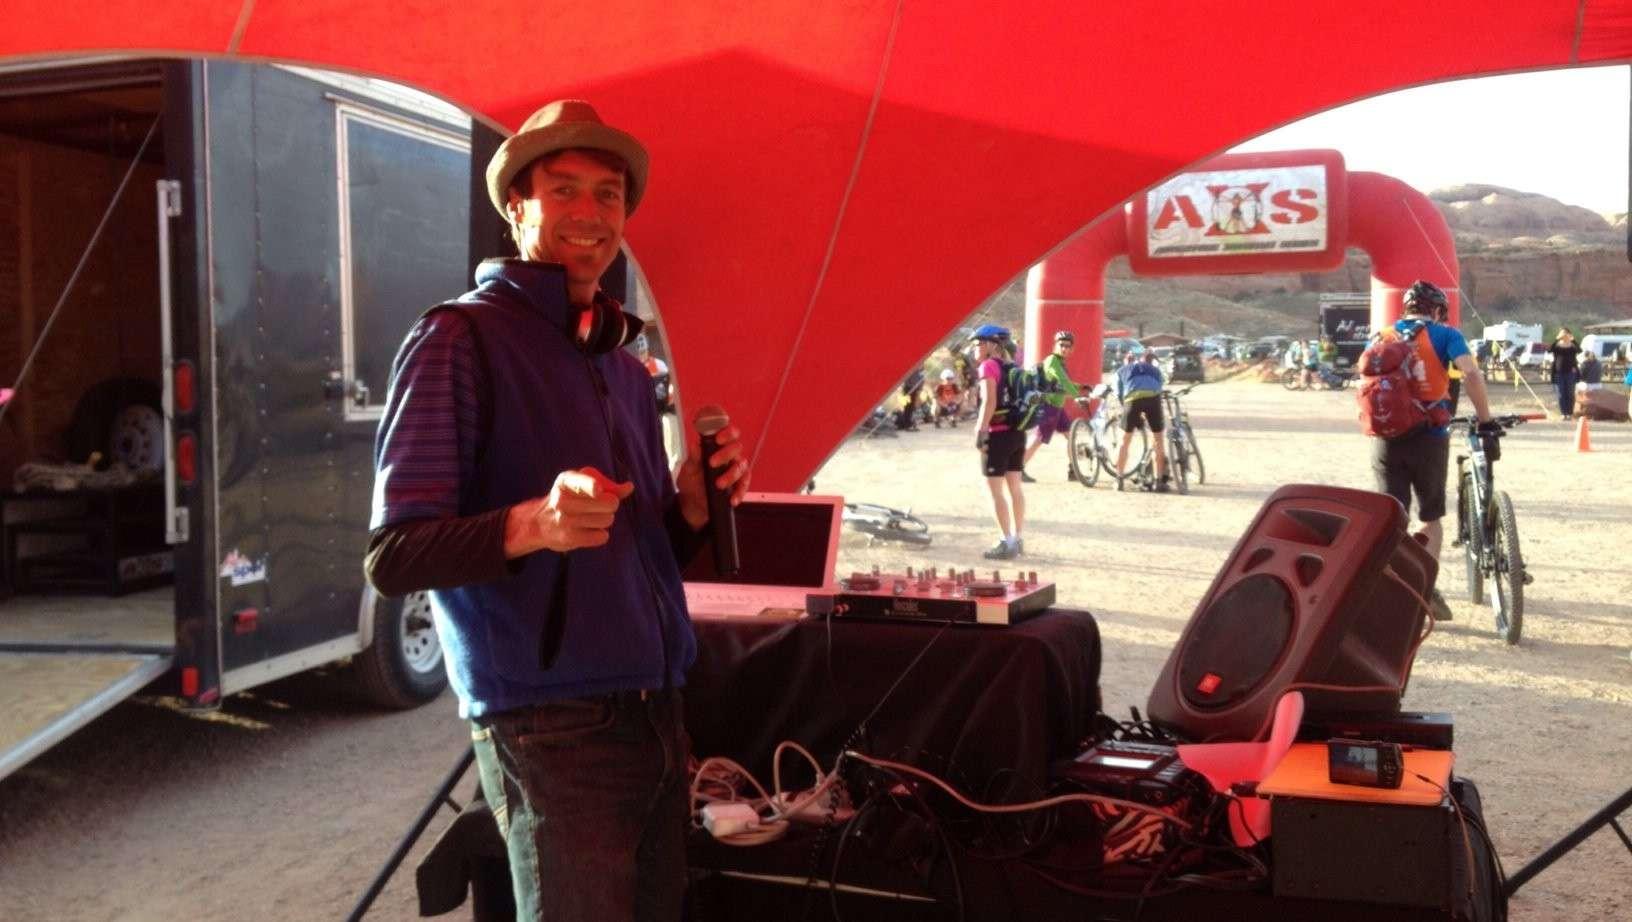 AXS Moab 50 mile race - post race entertainment by DJ CodeStar